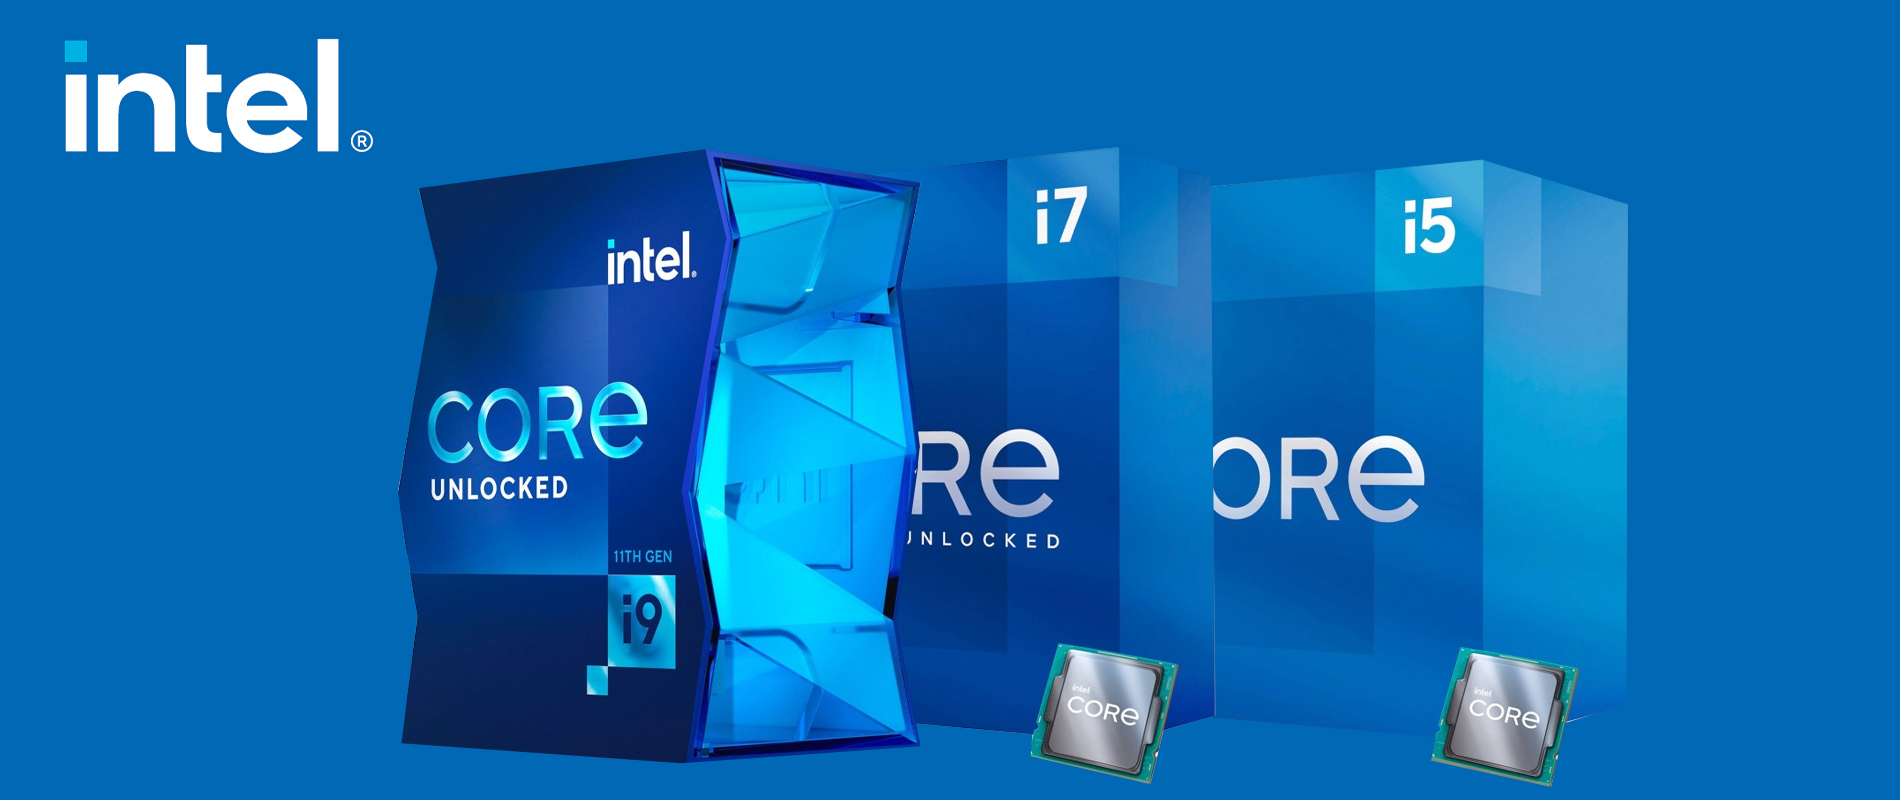 Intel 11. generacija procesora - Rocket Lake je stigao